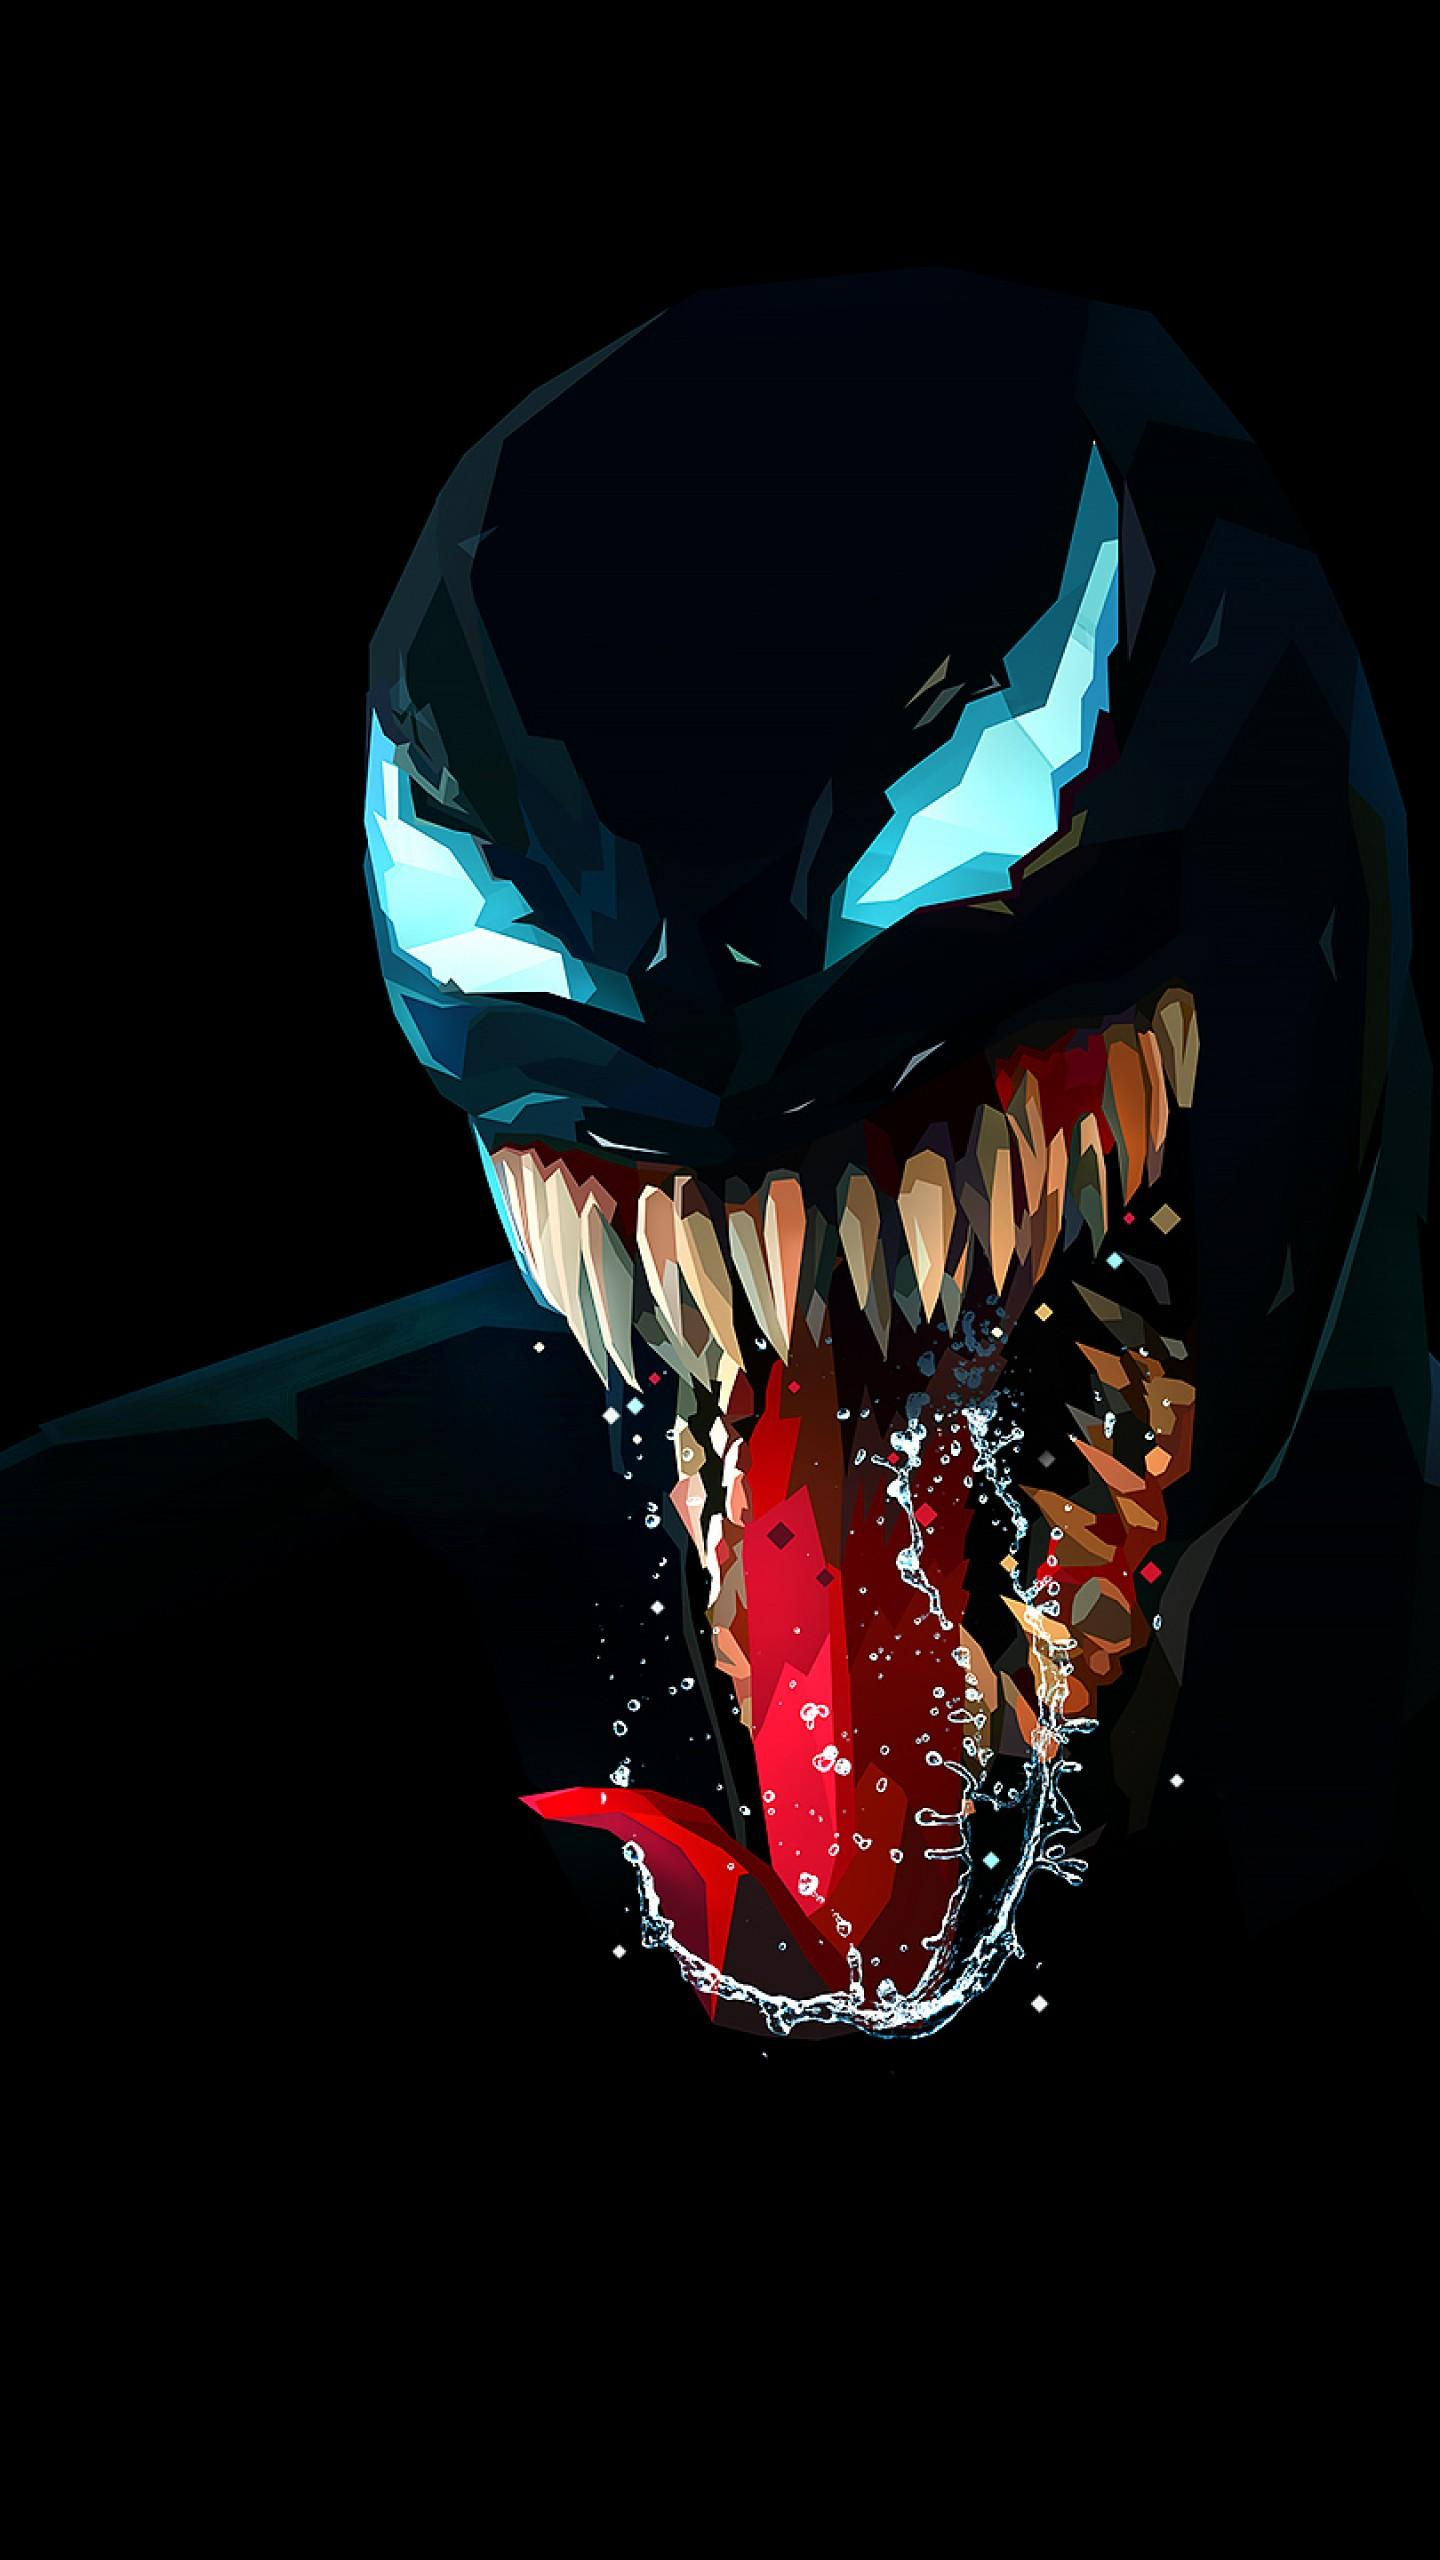 Venom Hd Iphone Wallpapers Wallpaper Cave